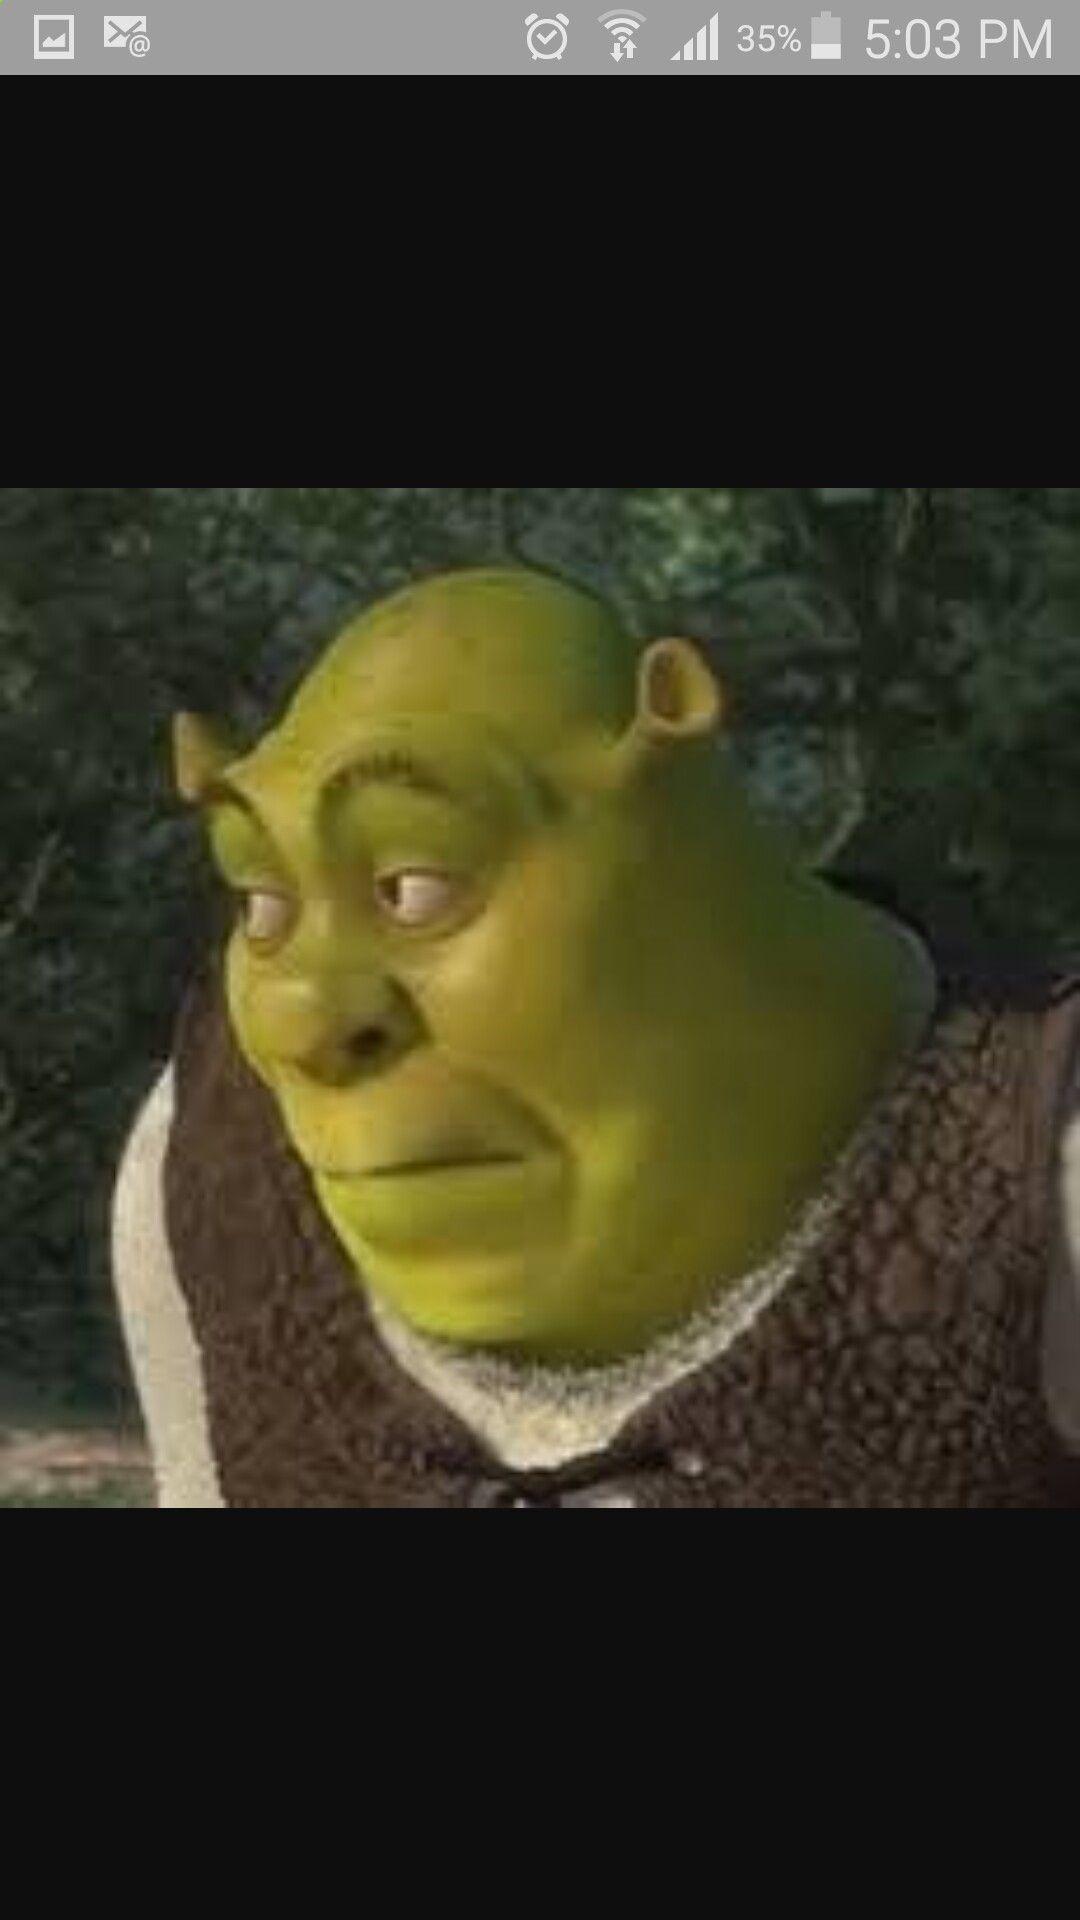 Shrek Memes En Espanol Memes Funny Faces Funny Mom Memes Funny Memes